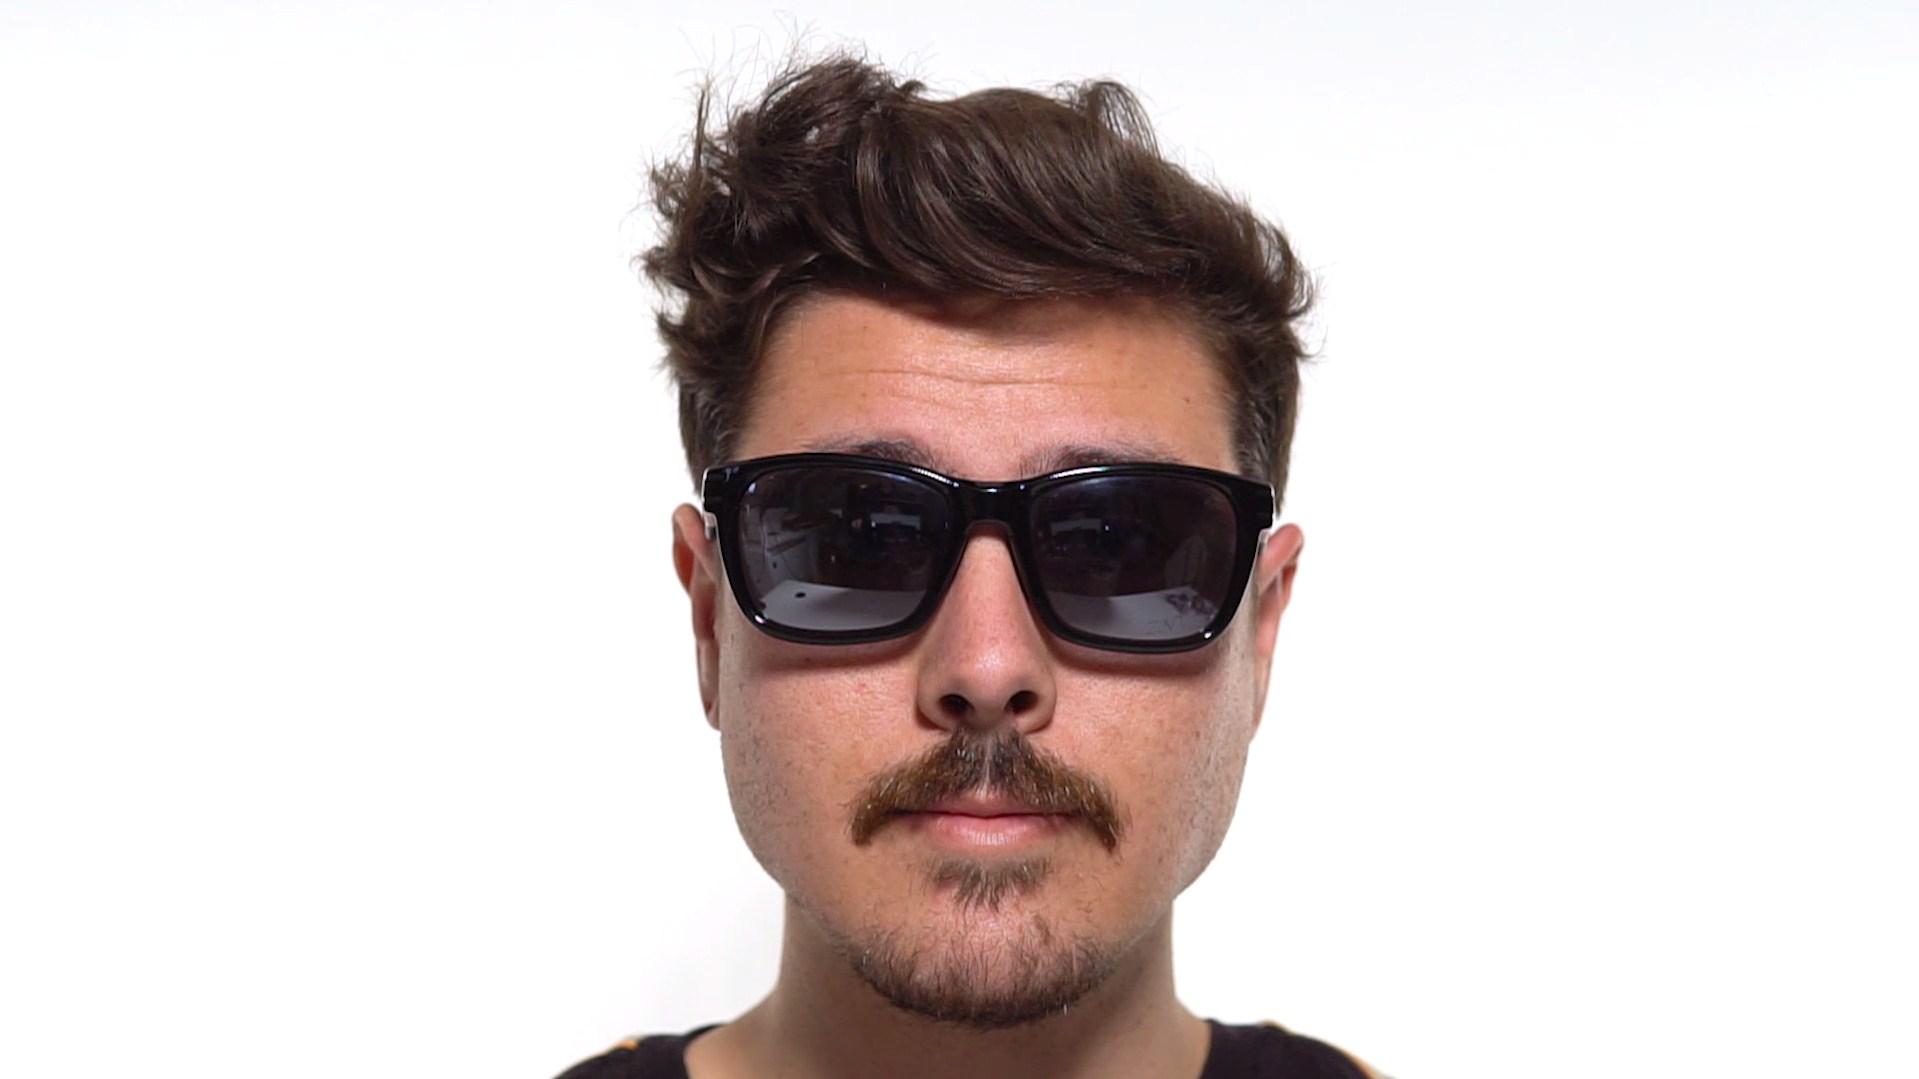 Matrix Surfrider Prescription Safety Sports Sunglasses